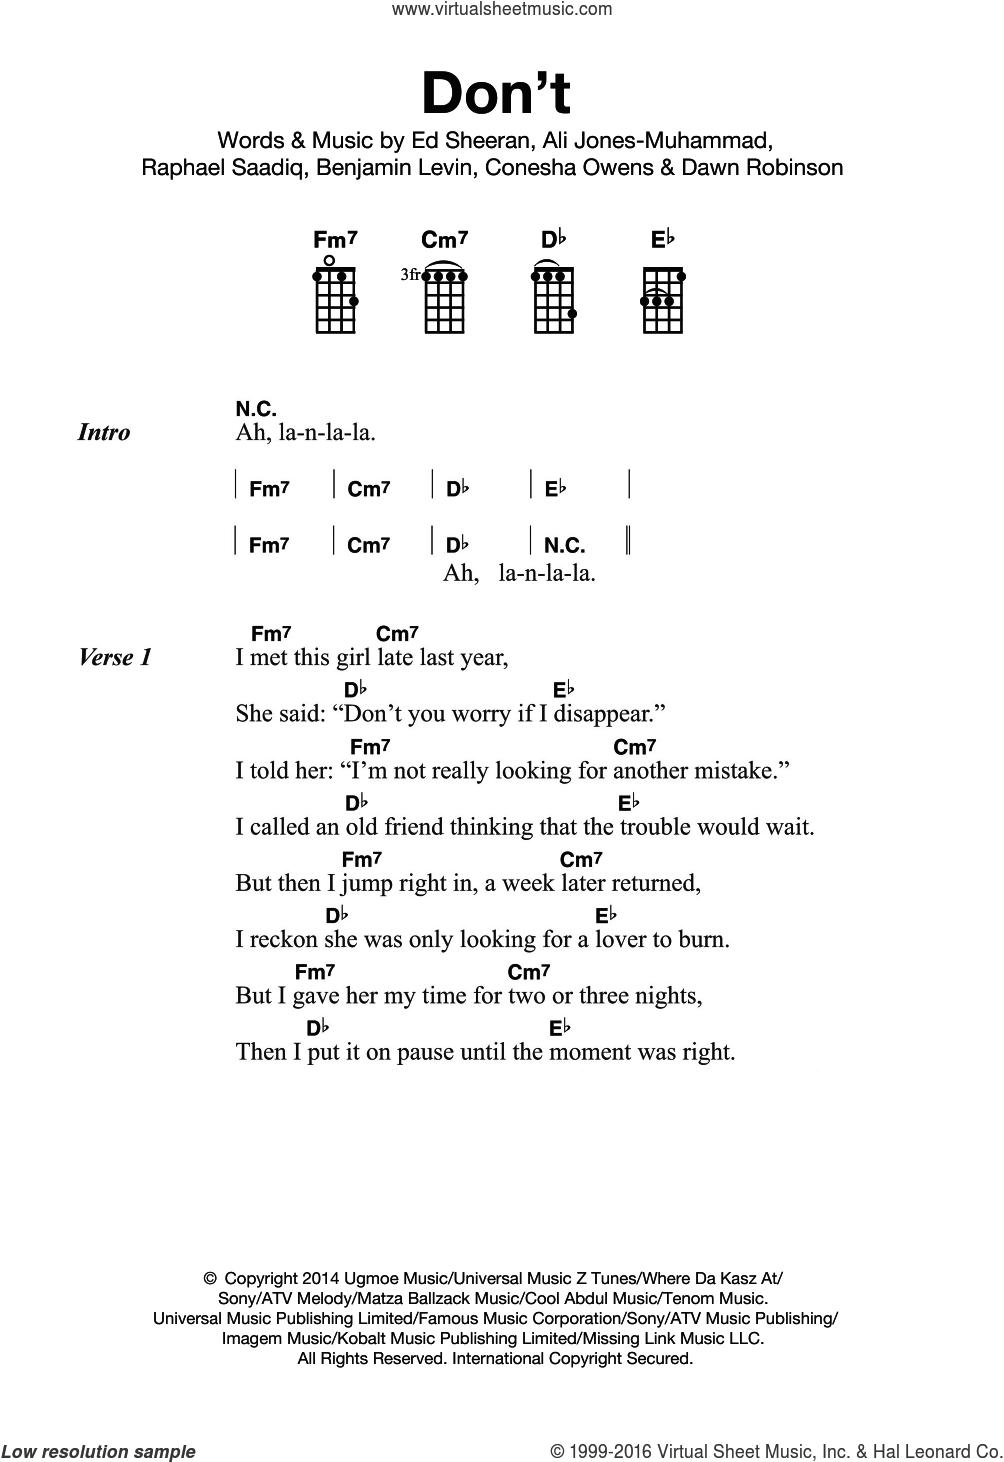 Don't sheet music for ukulele by Ed Sheeran, Ali Jones-Muhammad, Benjamin Levin, Conesha Owens, Dawn Robinson and Raphael Saadiq, intermediate skill level